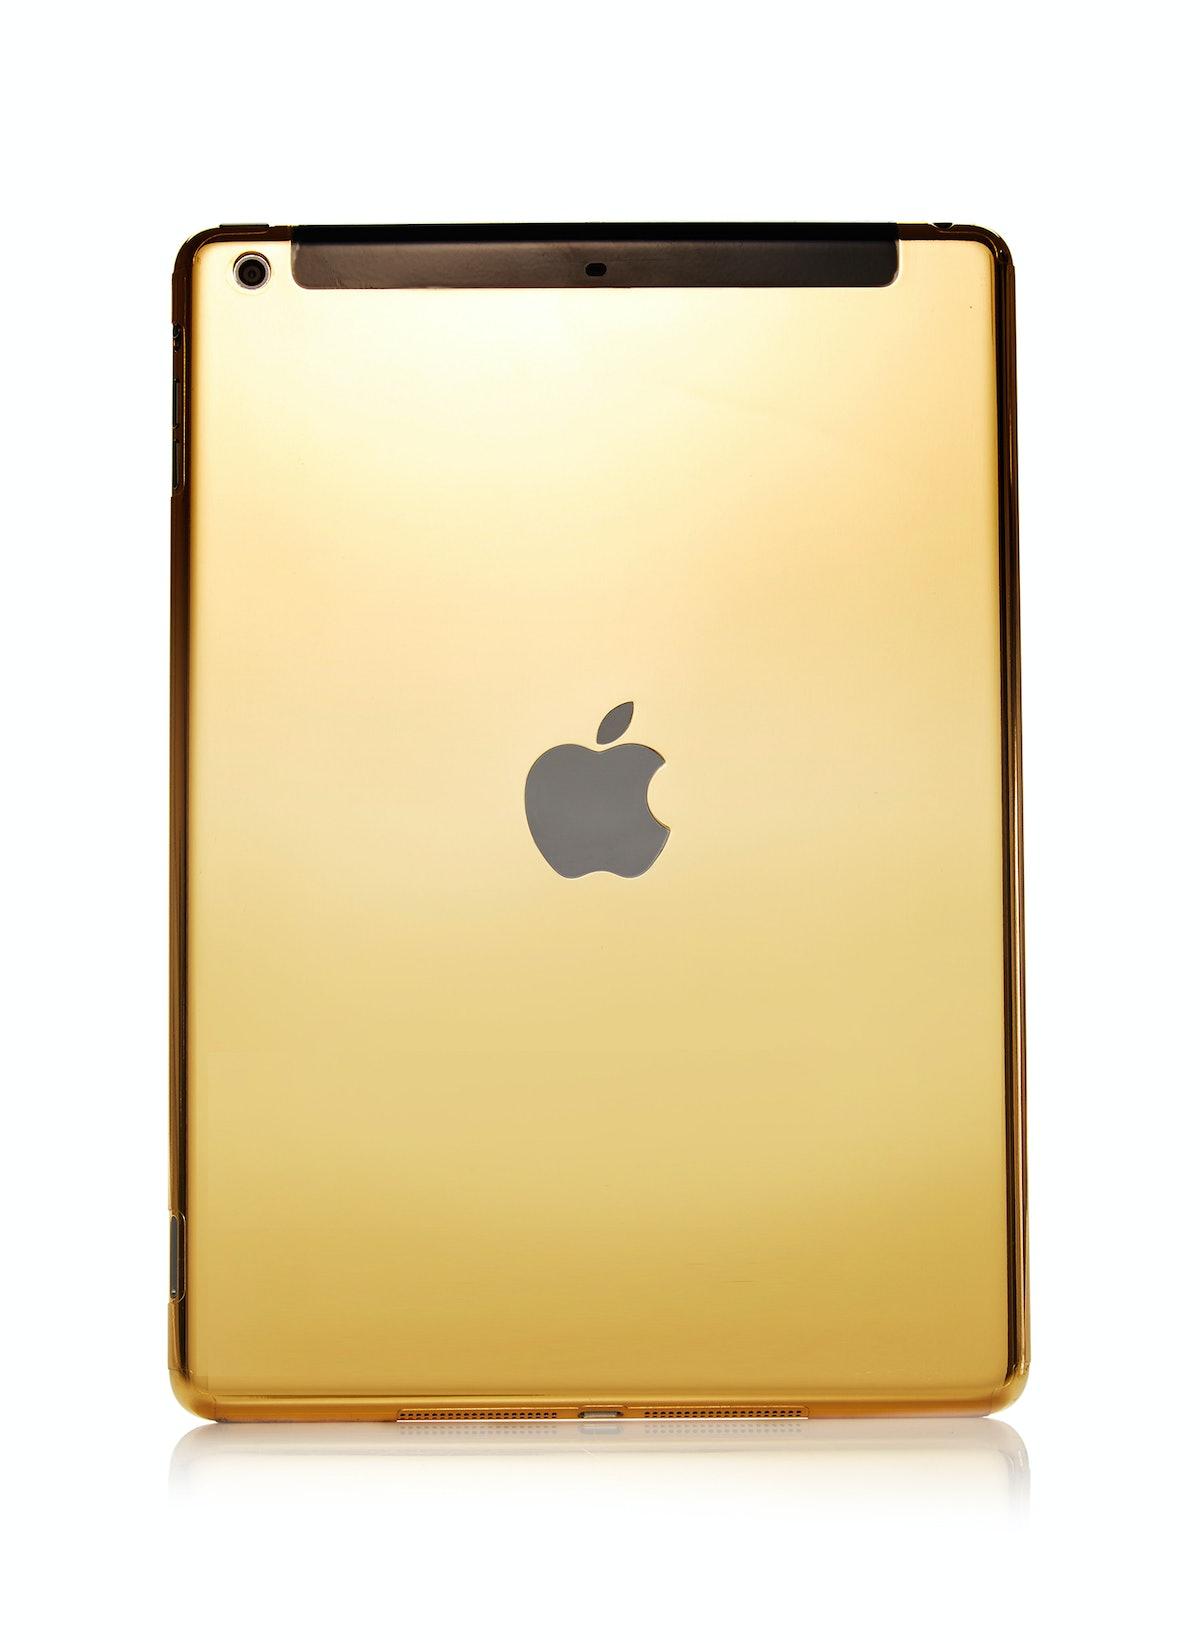 GoldGenie iPad in 24k gold